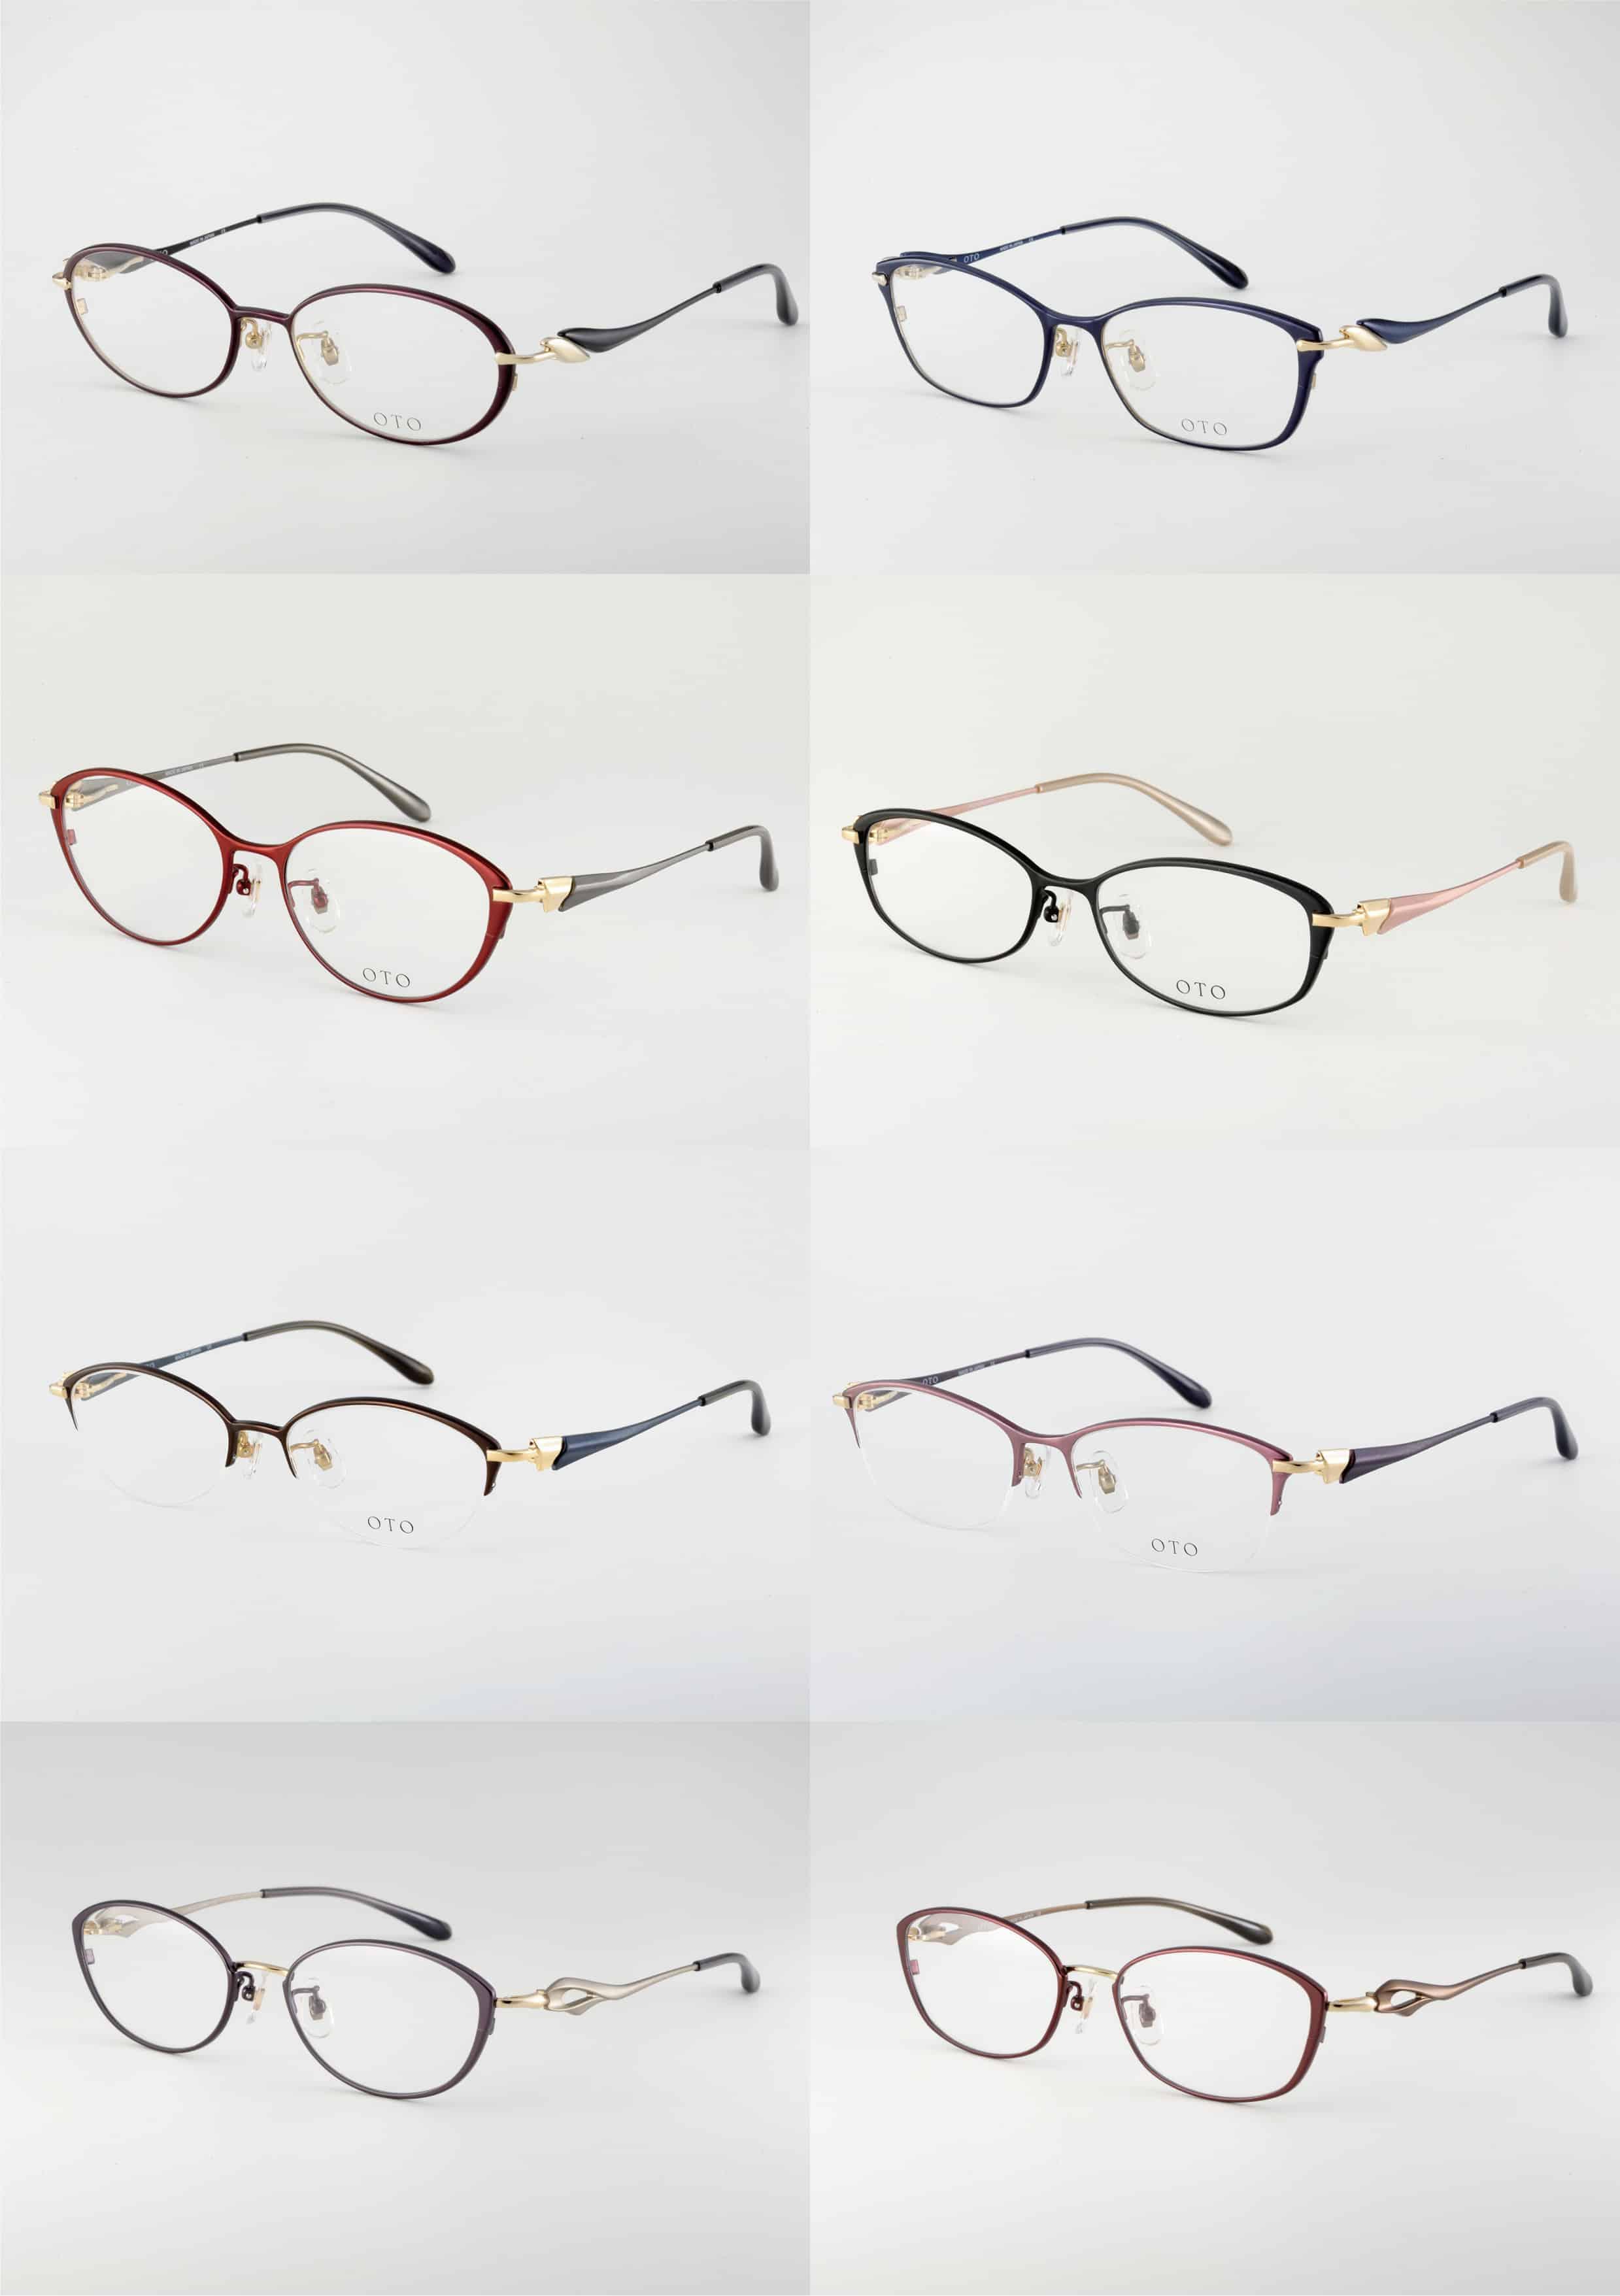 Oto eyewear